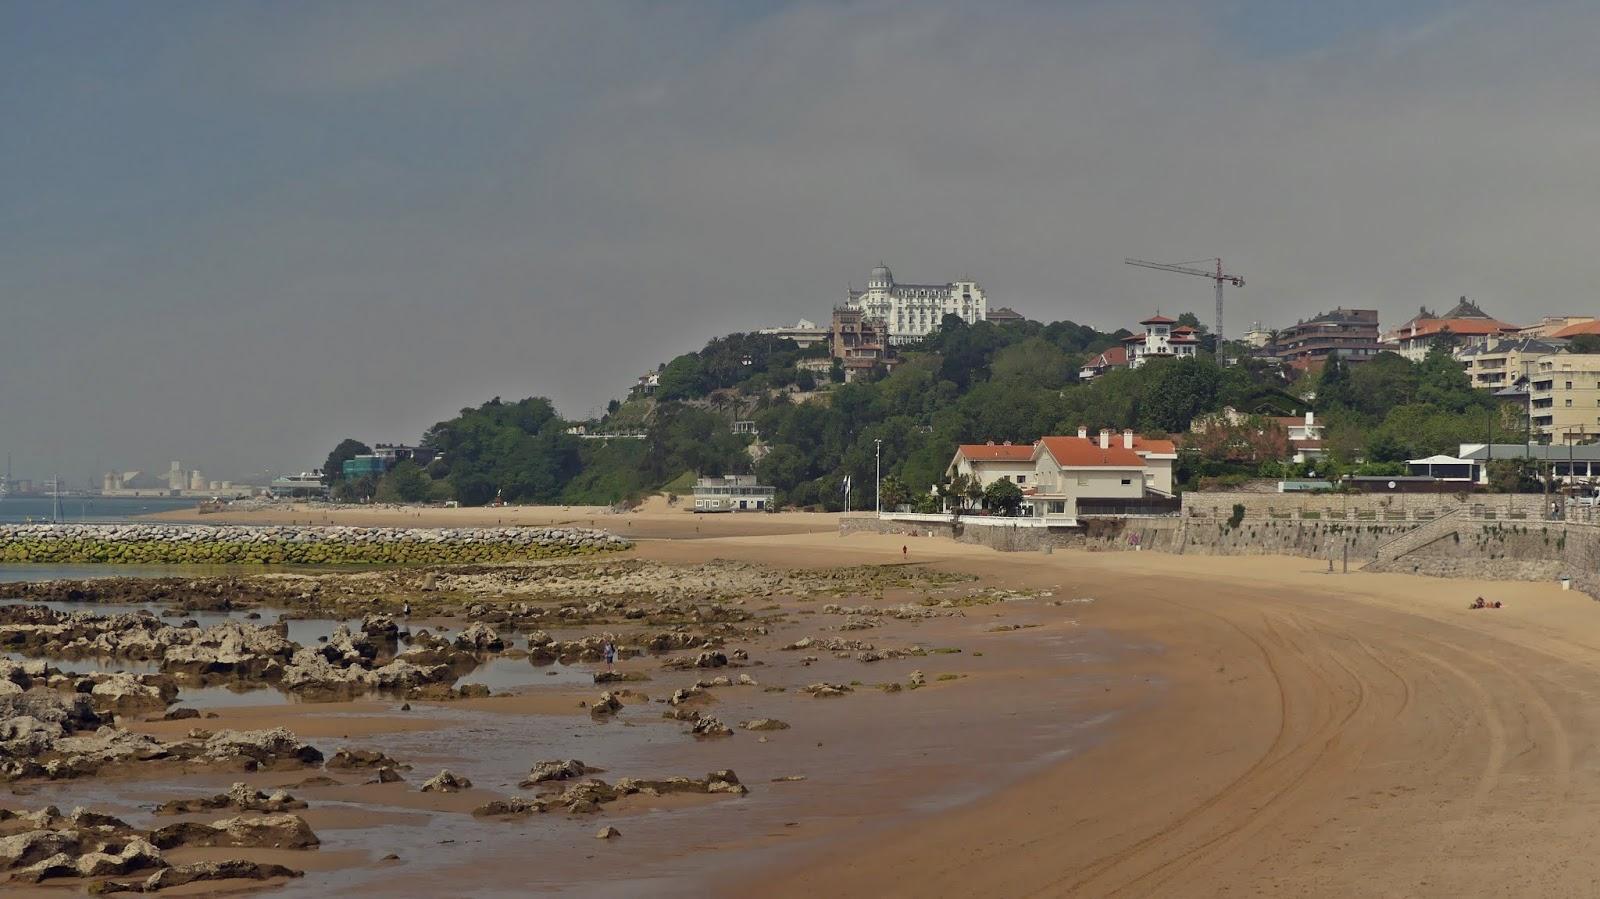 Playa de la Magdalena plaże w Santander